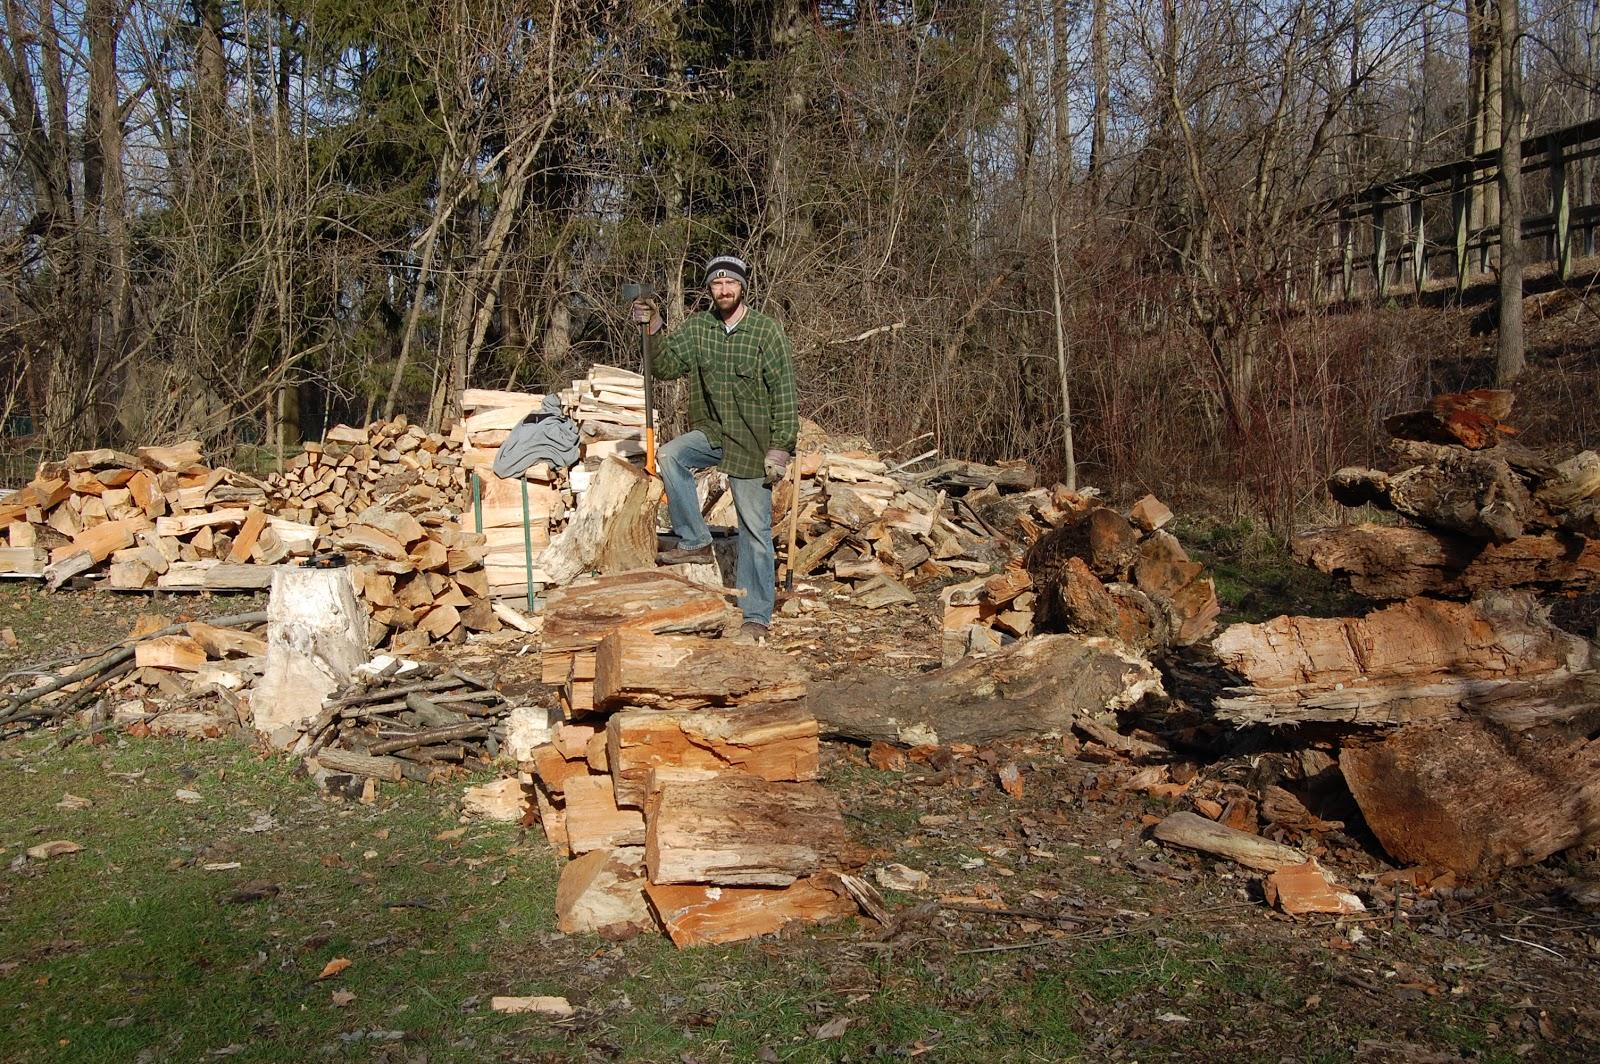 hugelkultur wood pile